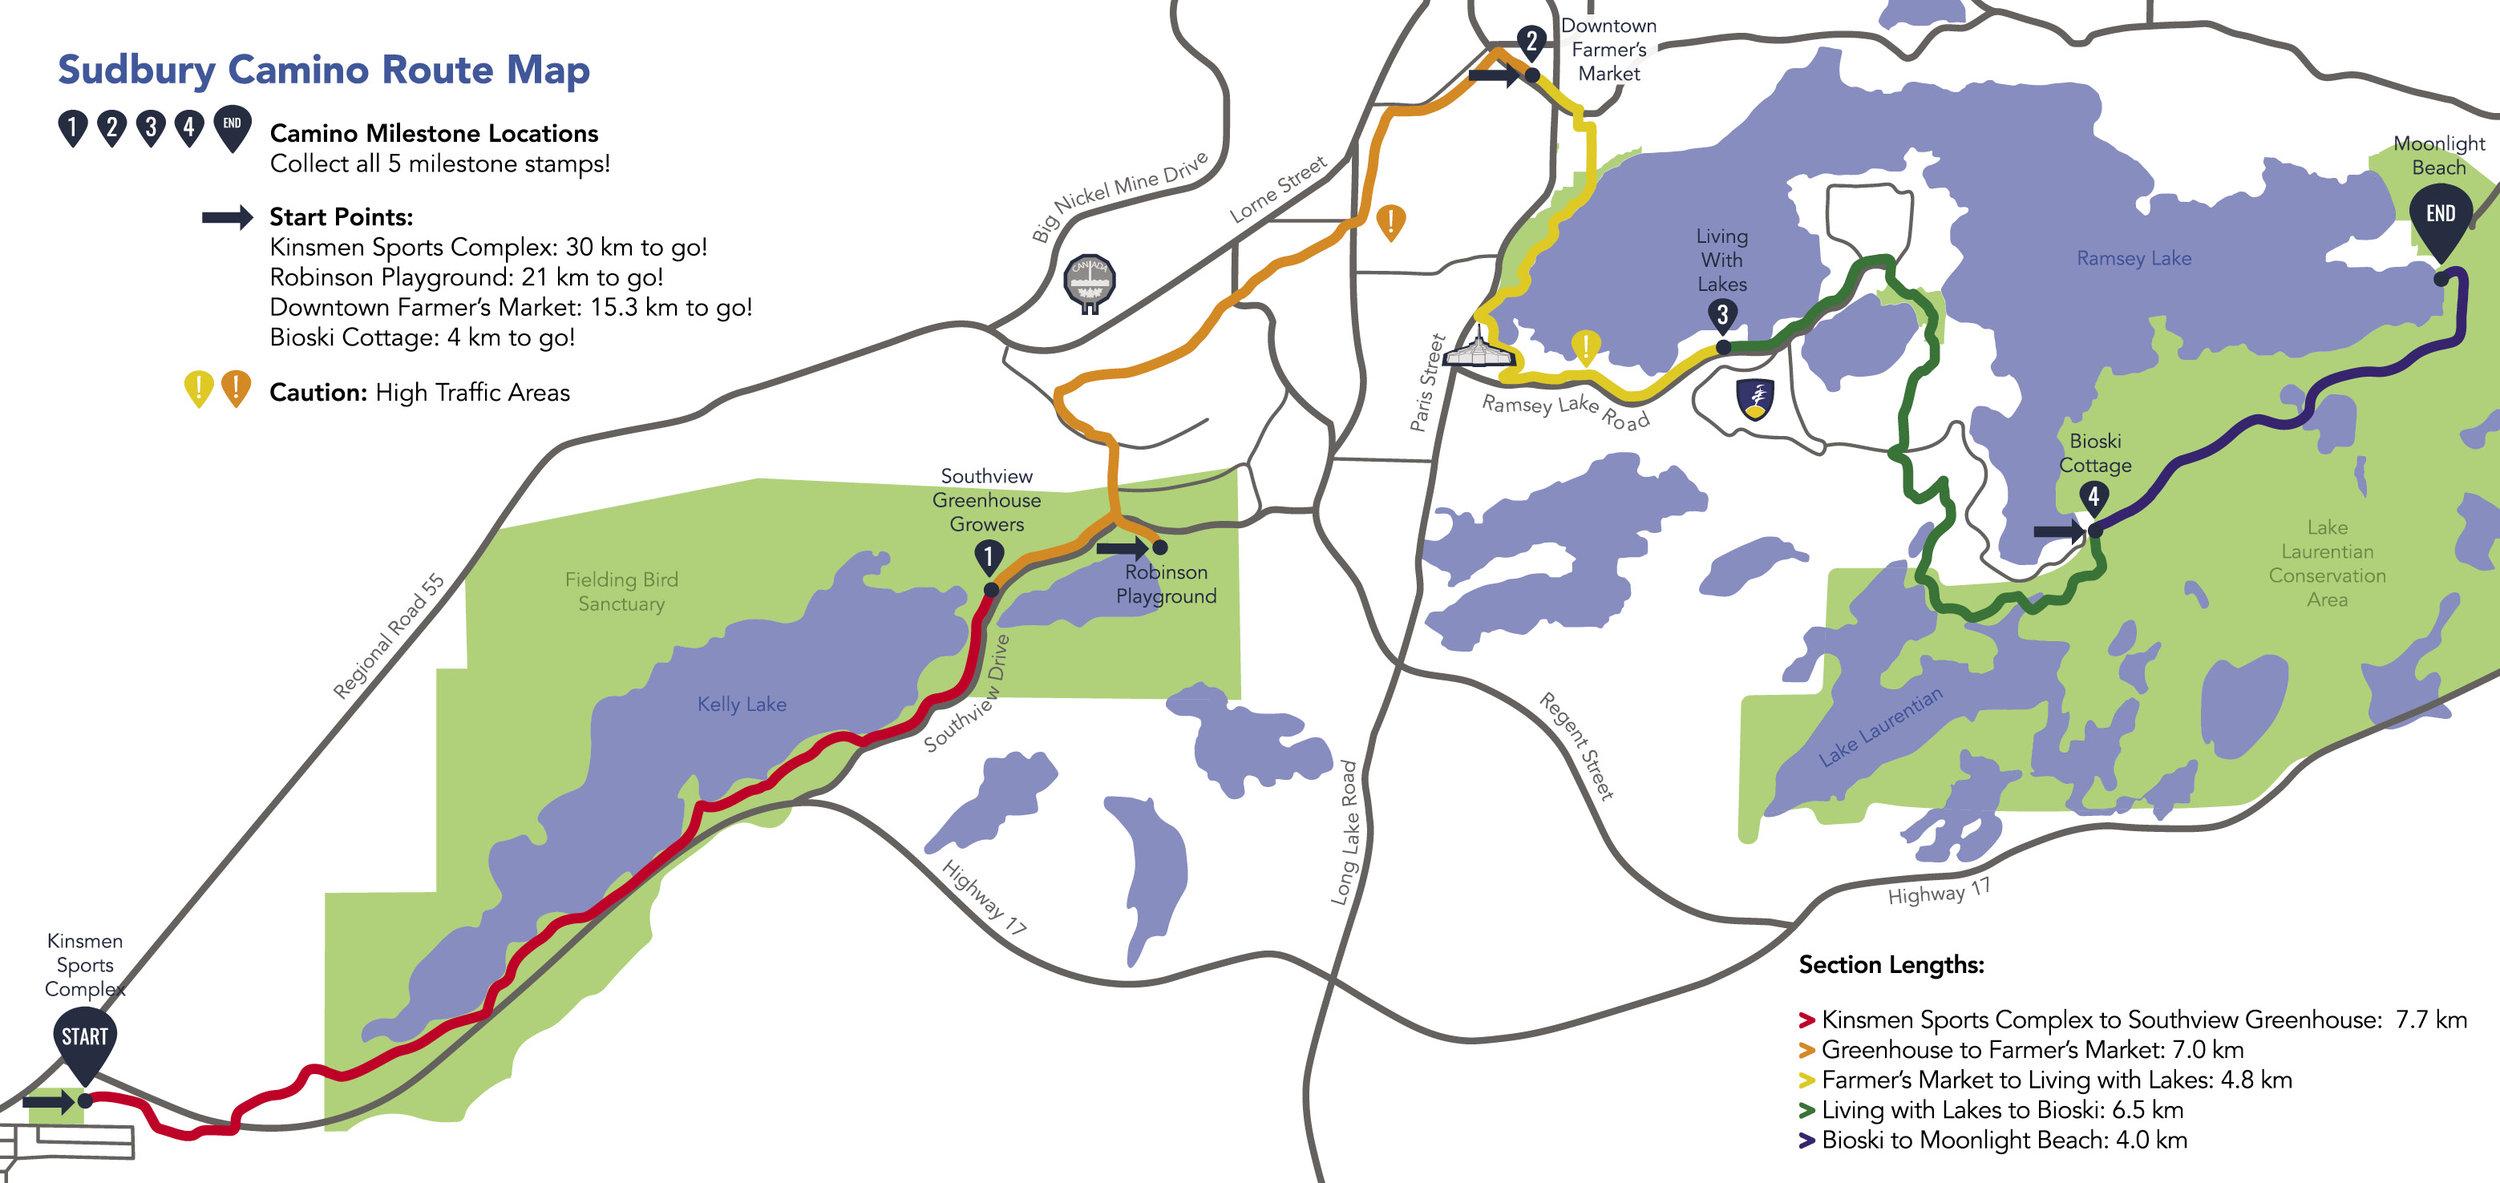 Sudbury-Camino-Map.jpg